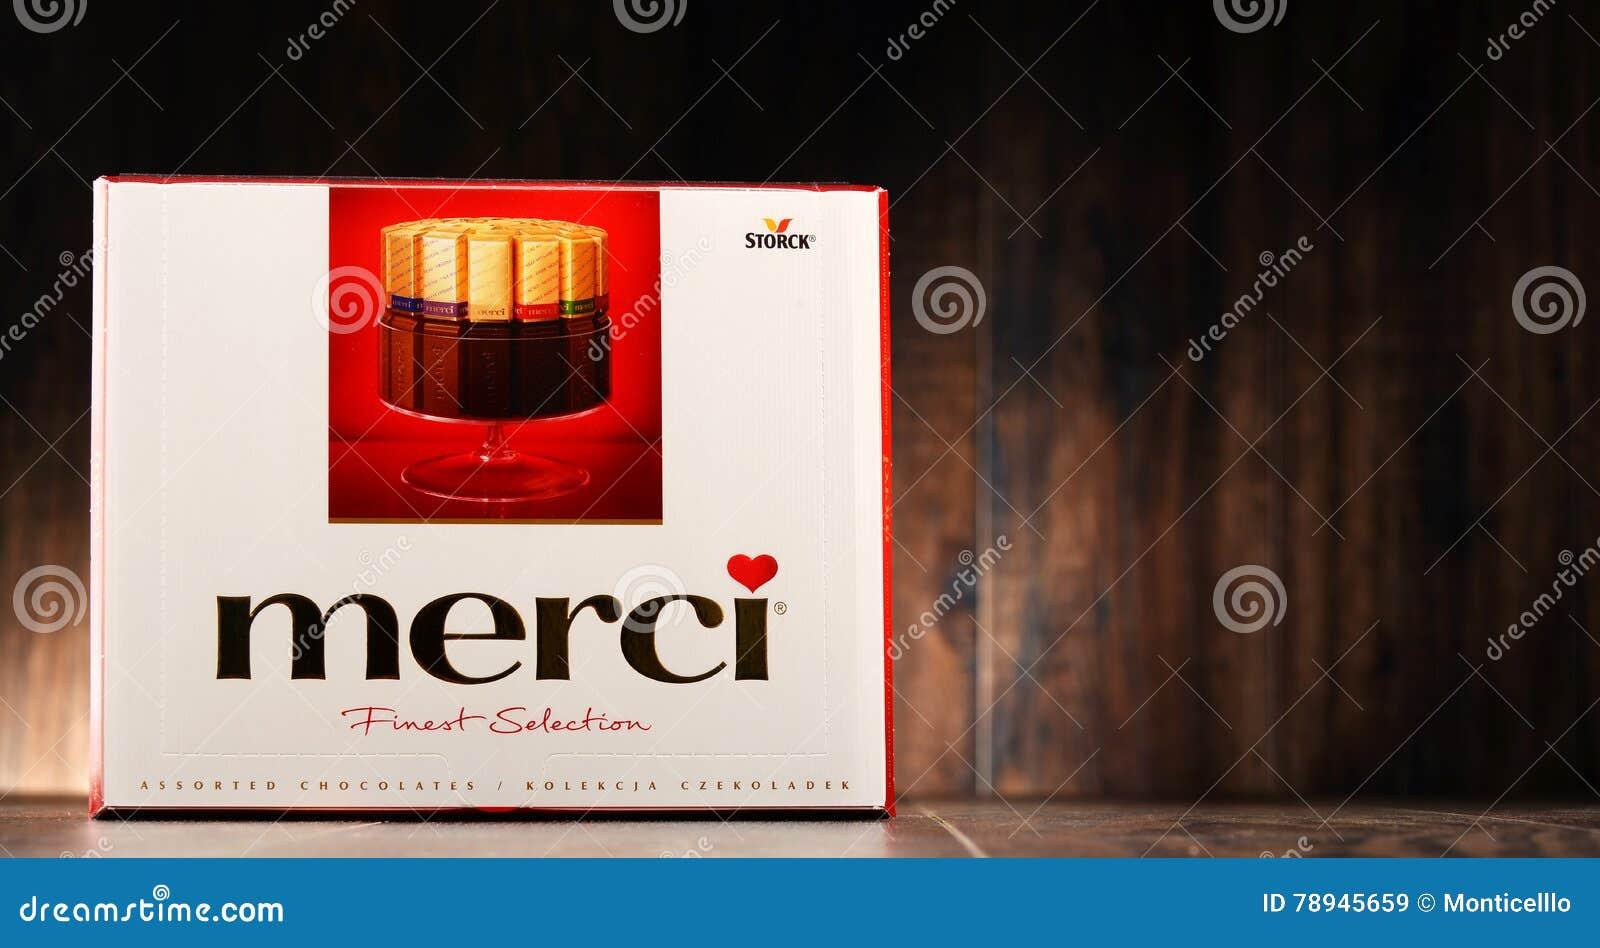 Merci Chocolate Candy Box Editorial Stock Image - Image: 78945659